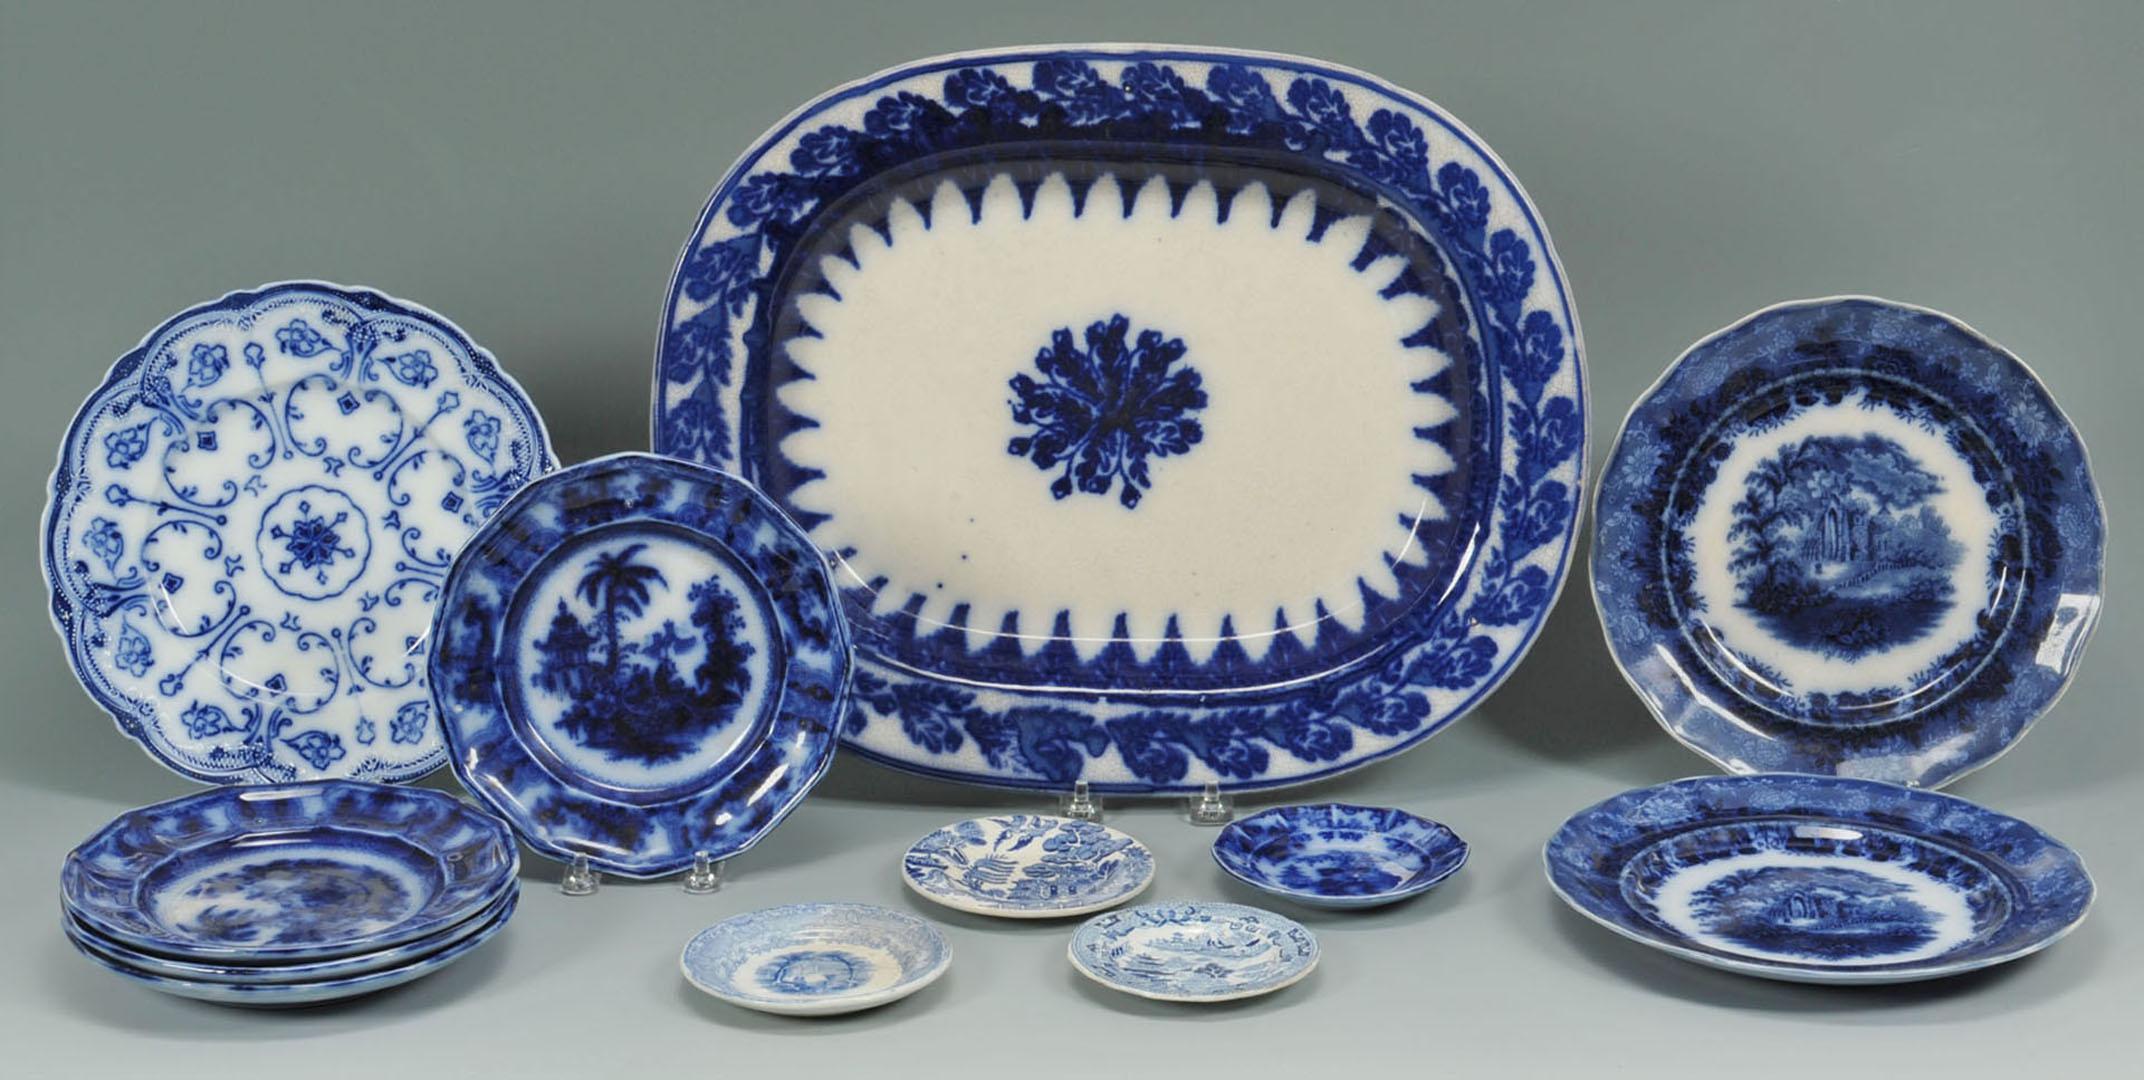 Engleska keramika  - Page 4 2872338_1